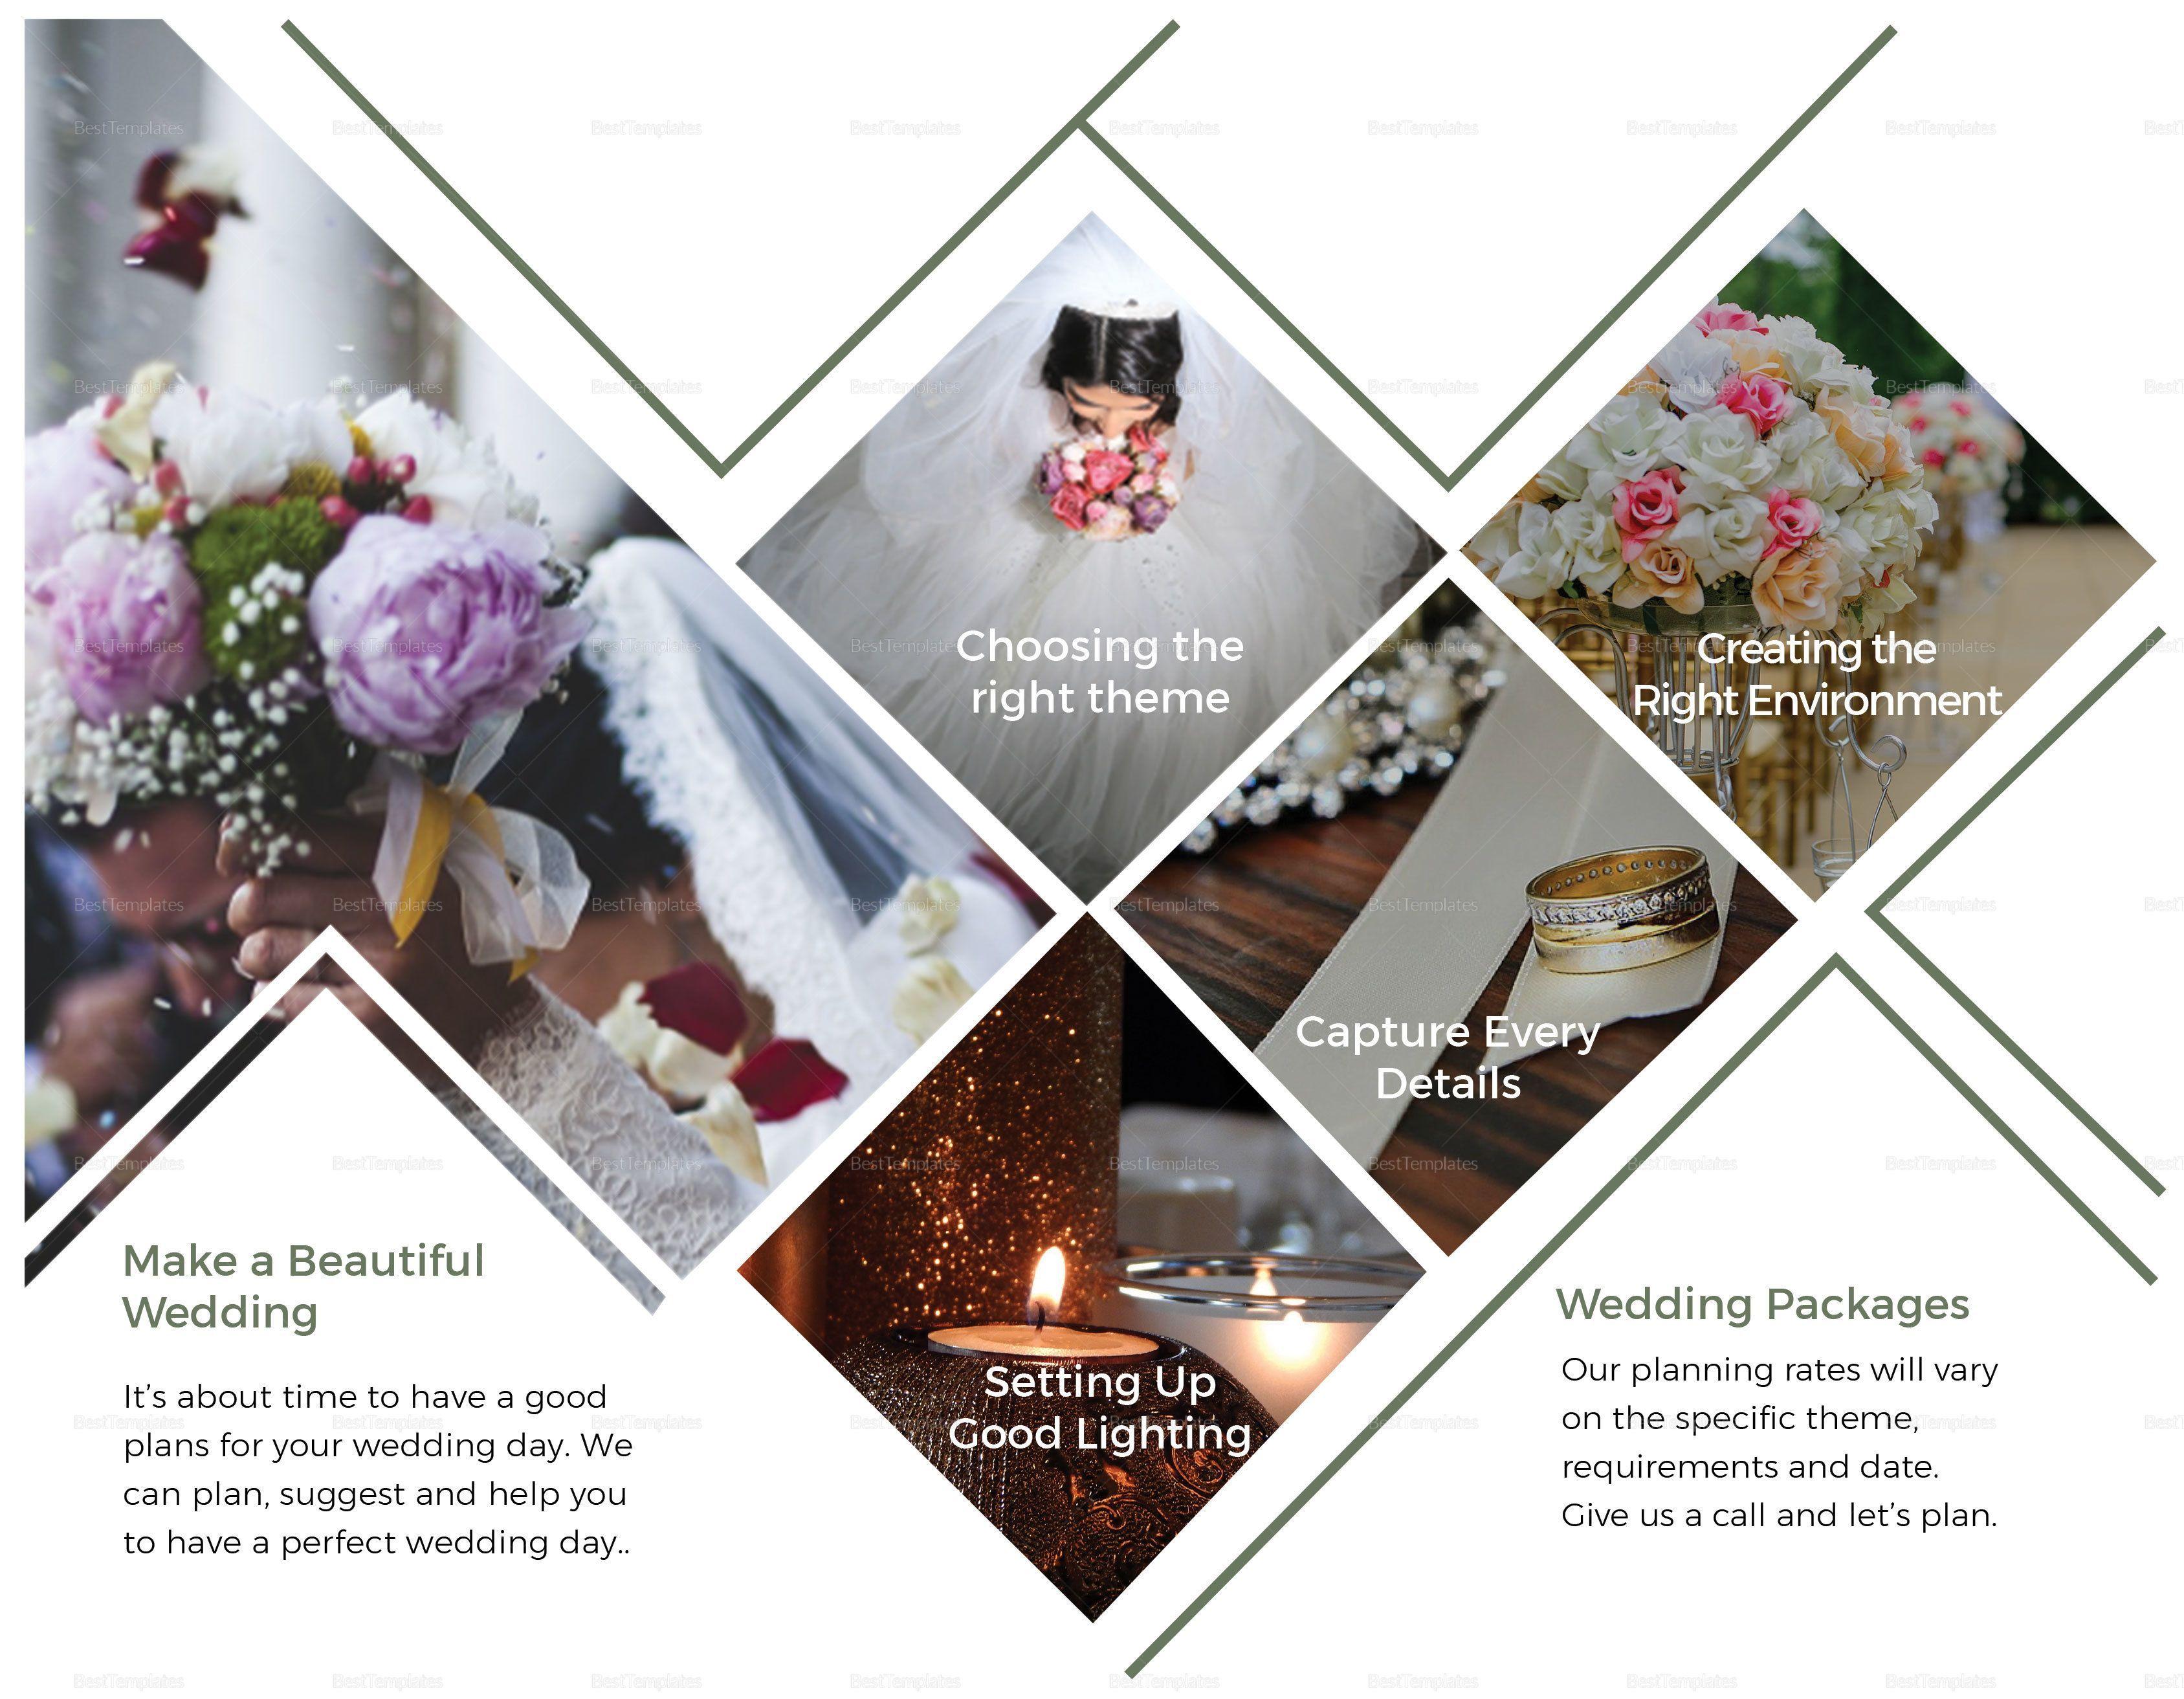 Wedding Planner Brochure Design Template in PSD, Word, Publisher, Illustrator, InDesign… in 2020 ...